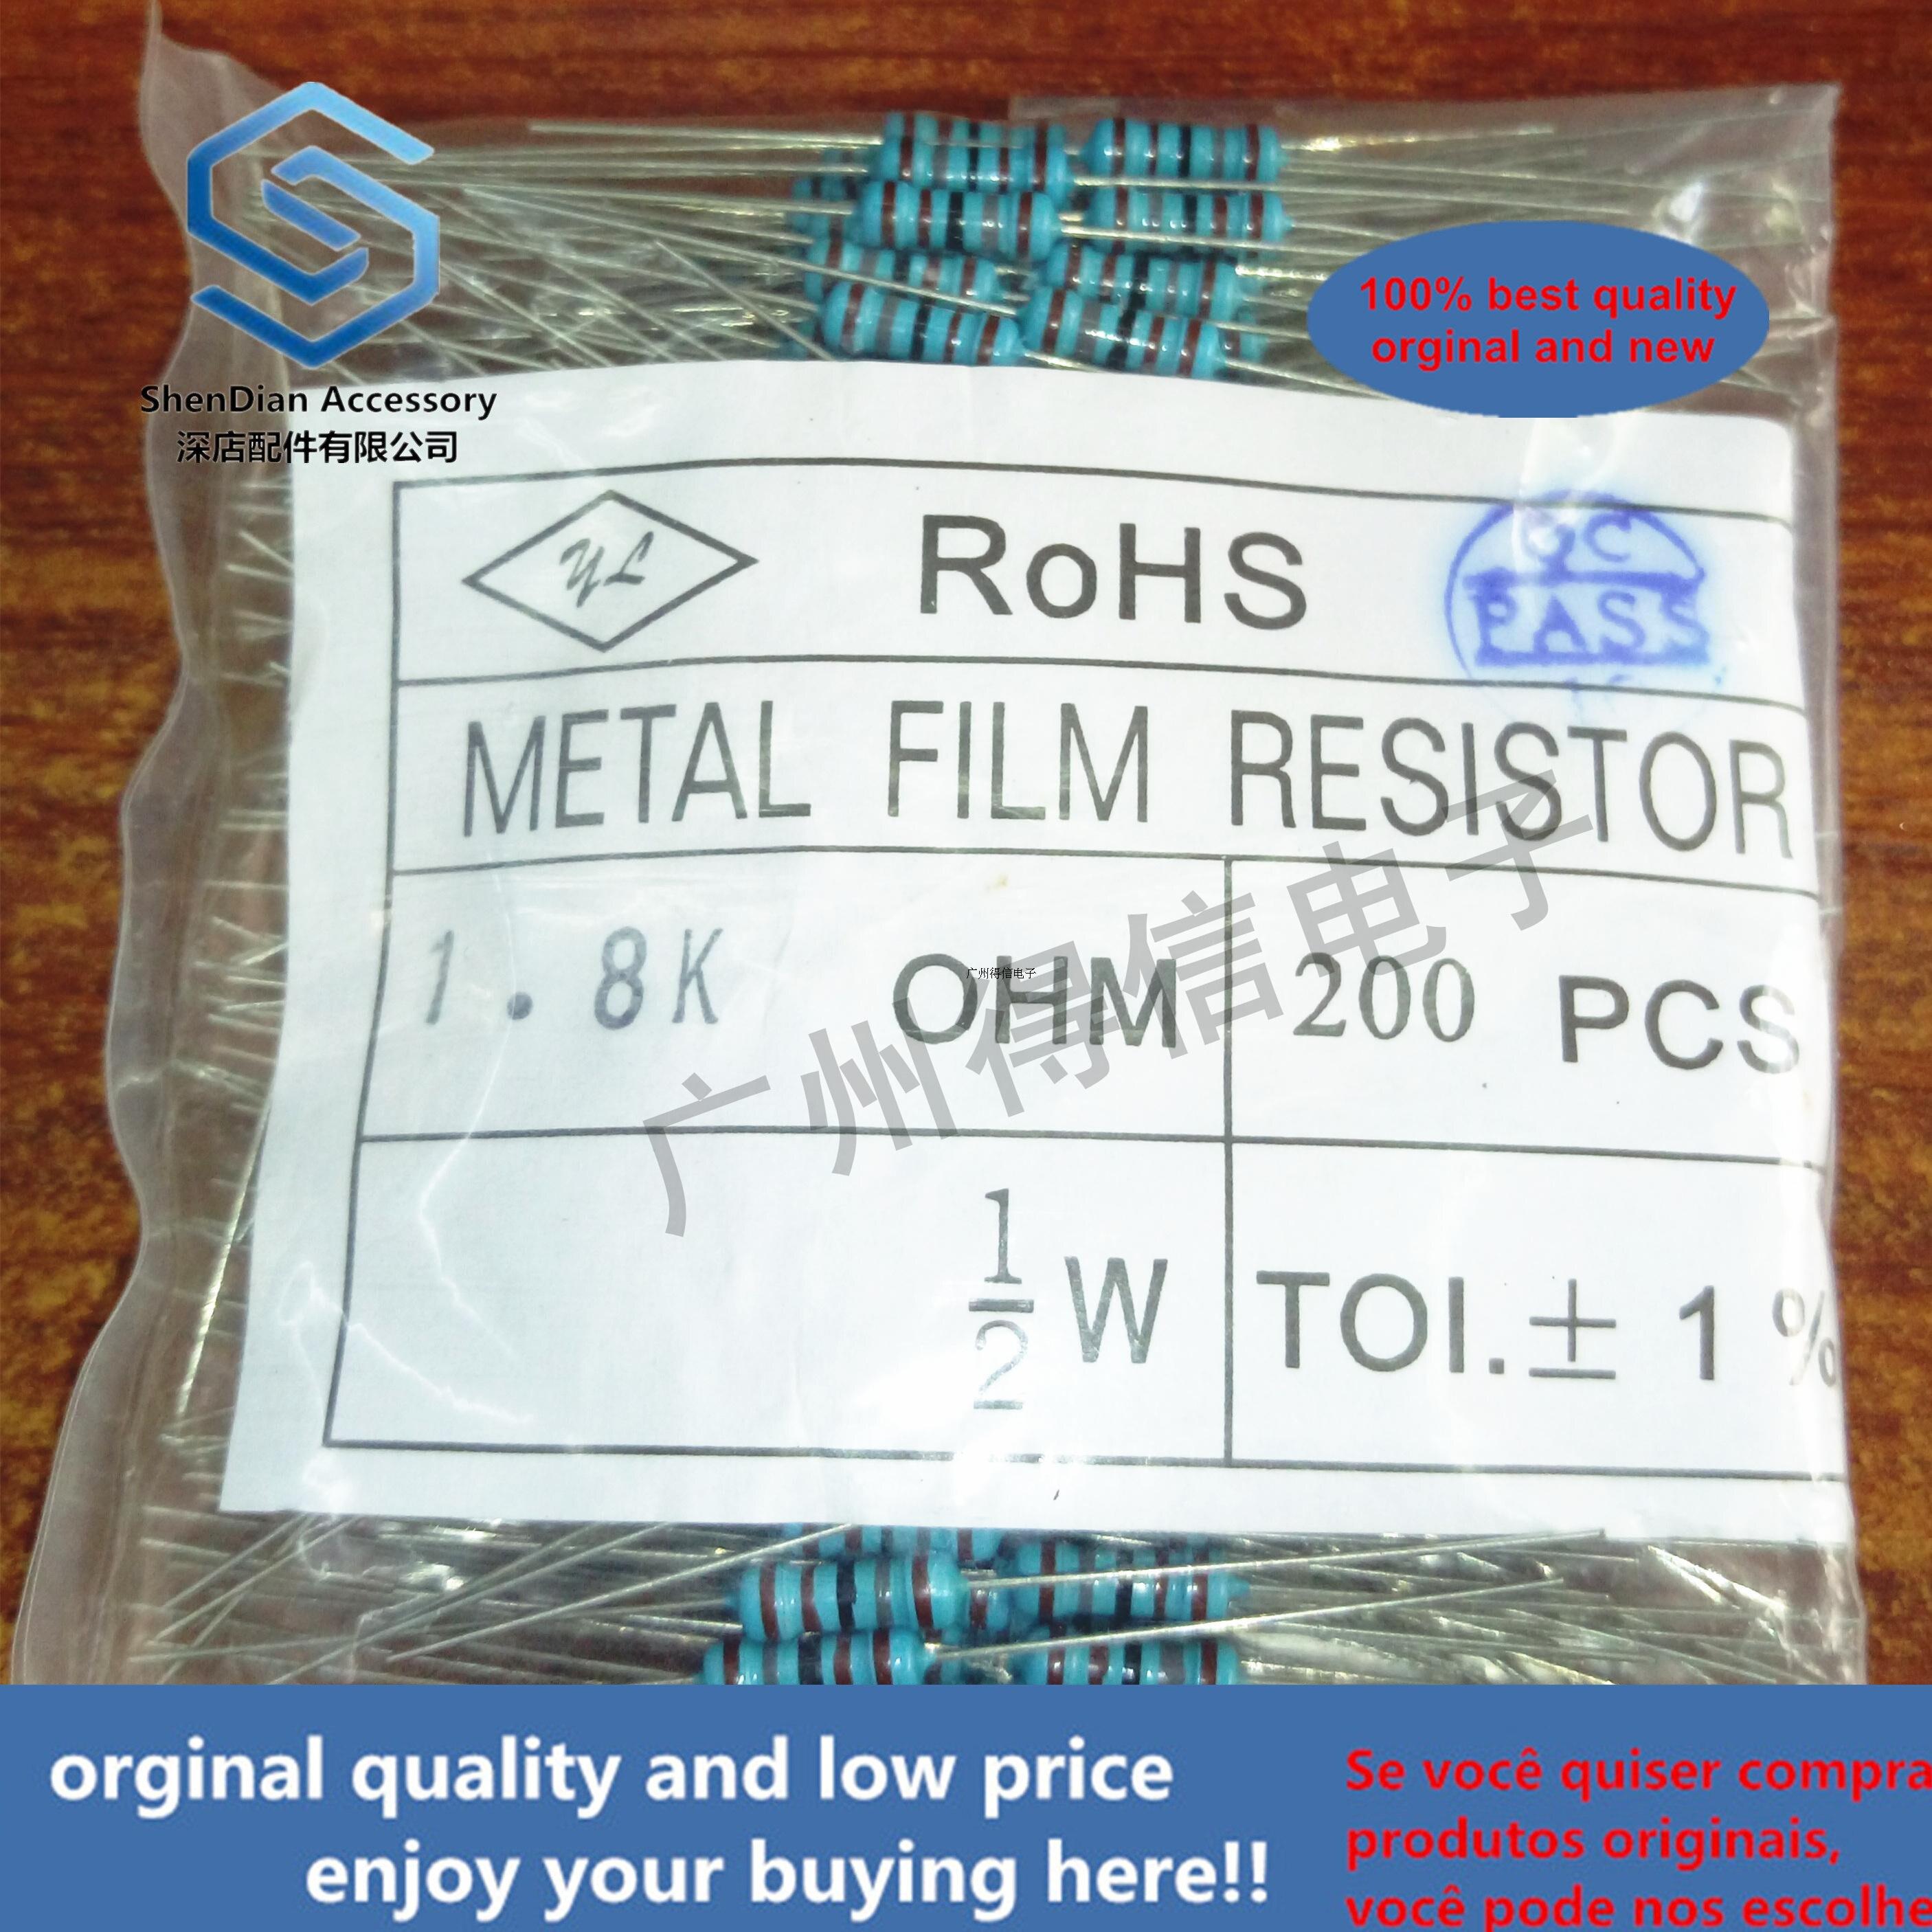 200pcs 1 / 2W 5.1K 5100 Euro 1% Brand New Metal Film Iron Feet Resistance Bag 200 Pcs Per Pack